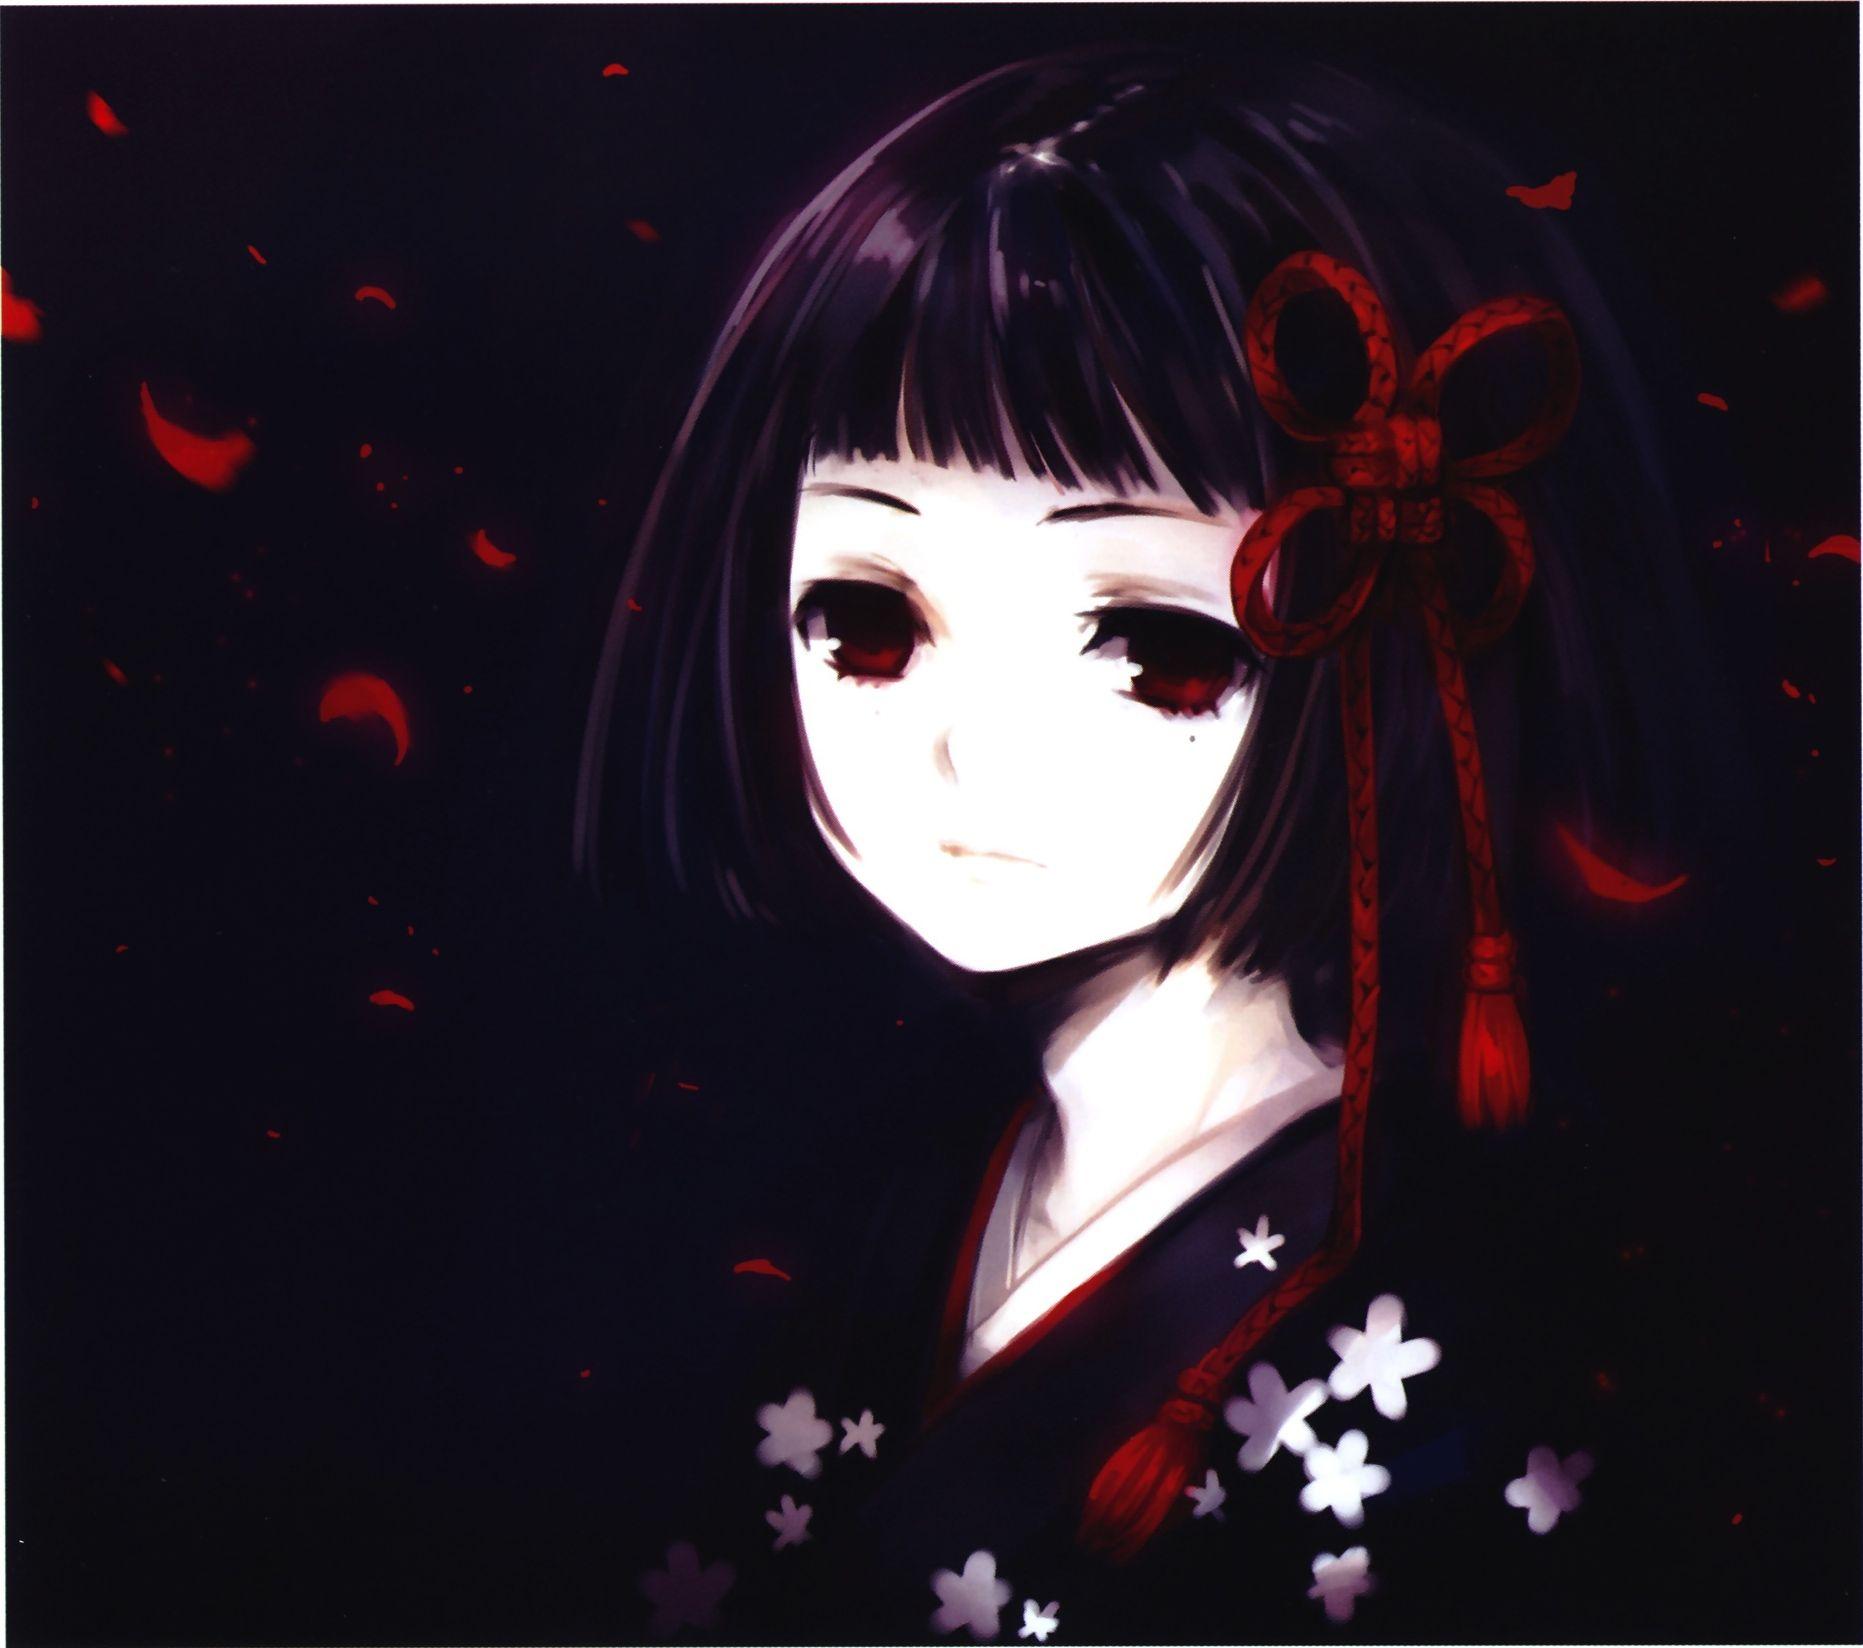 Art Anime Manga Anime Dark Anime Anime